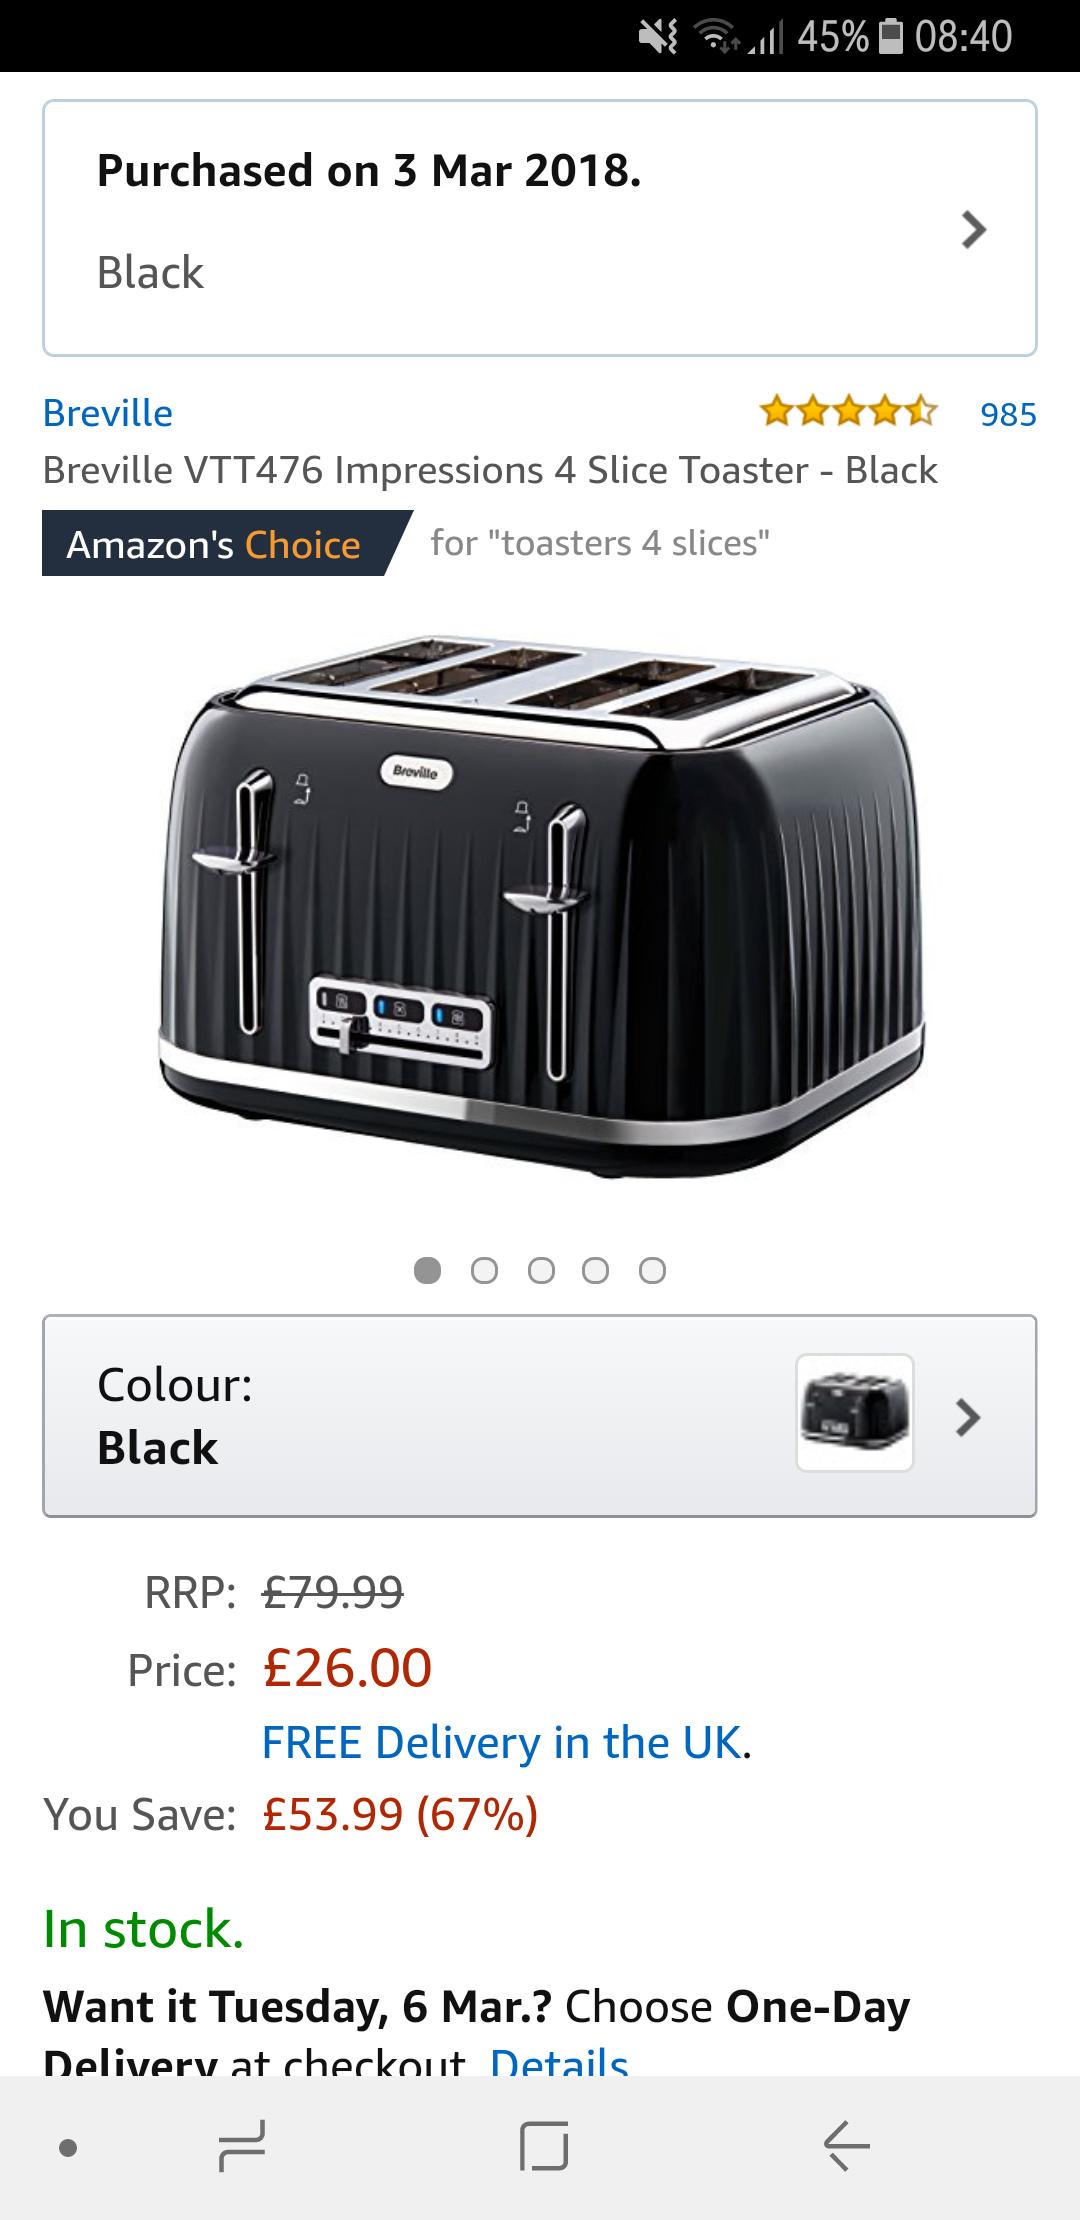 Breville VTT476 Impressions 4 Slice Toaster - Black at Amazon for £26